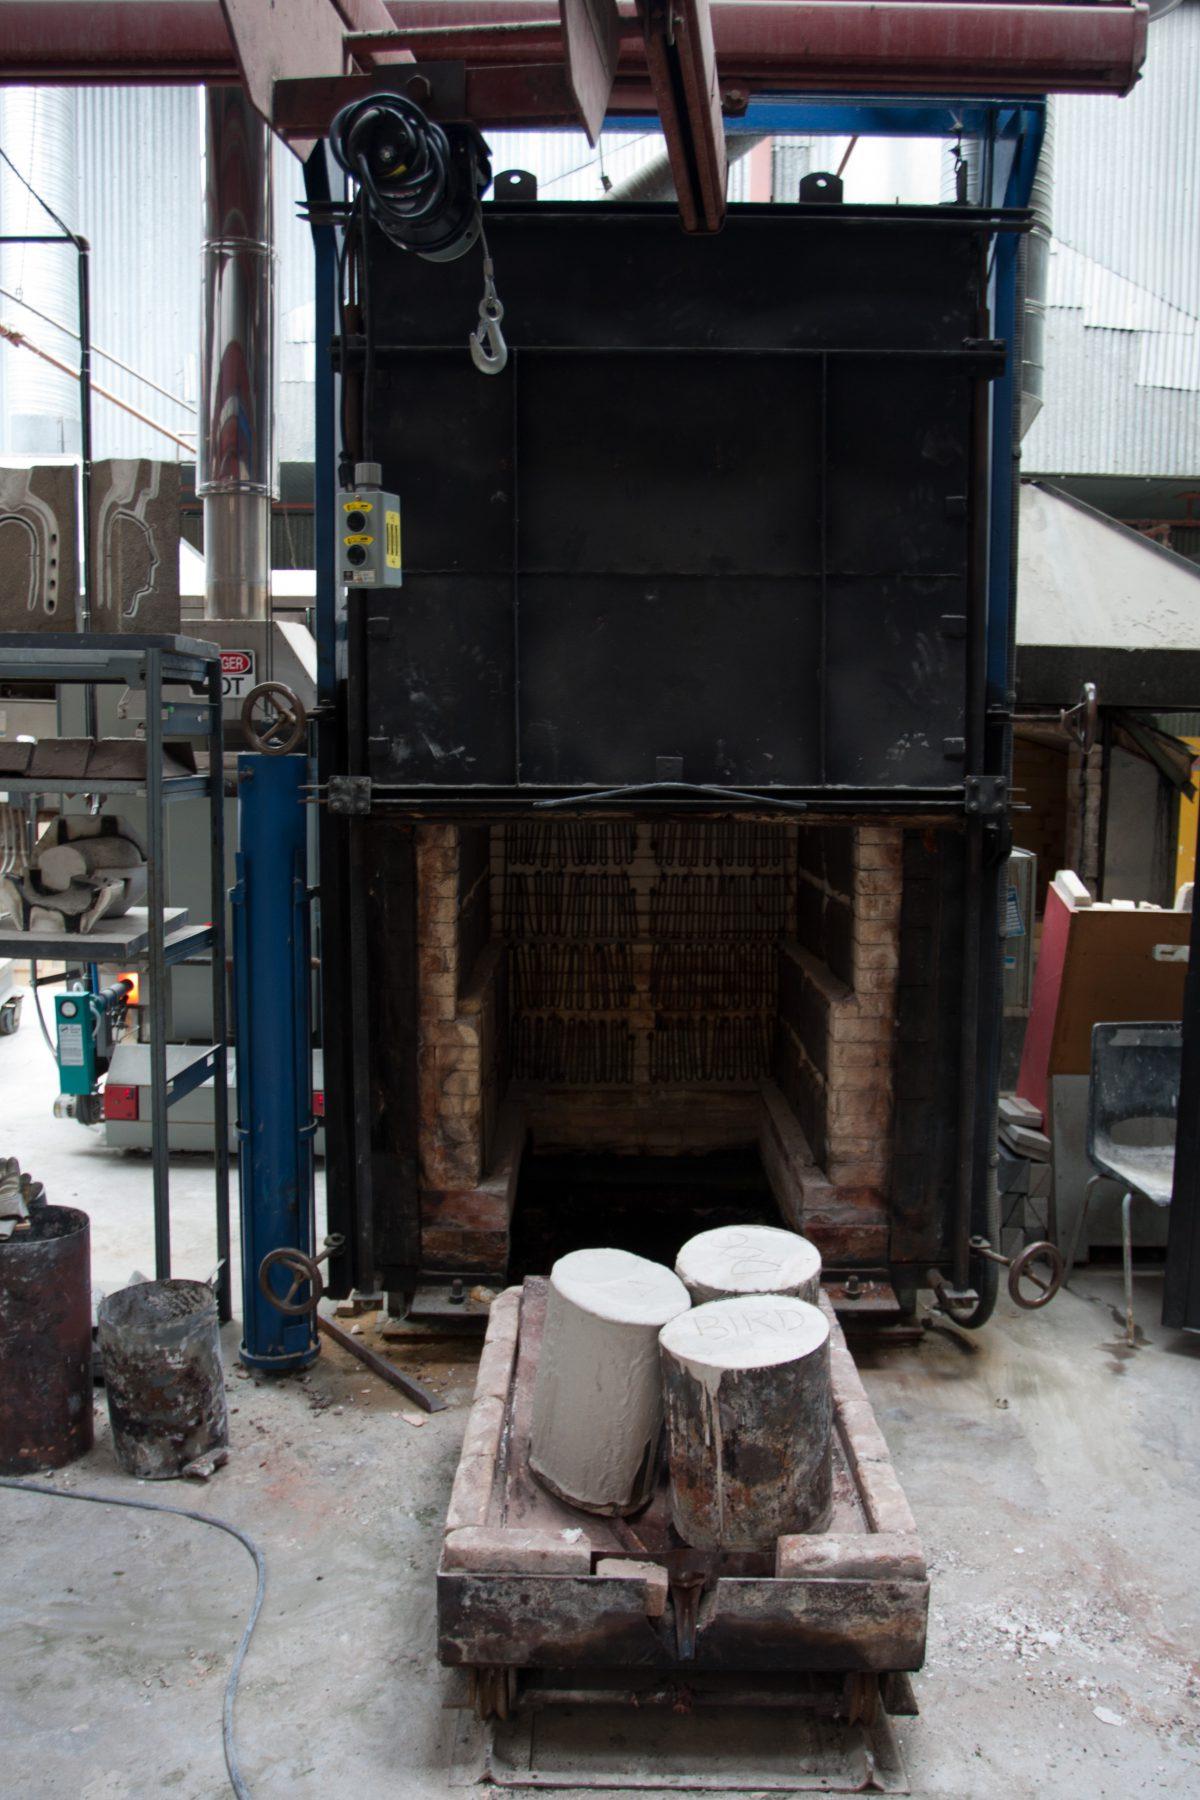 Kiln - At Emily Carr University metal workshop, workshop, machine, foundry